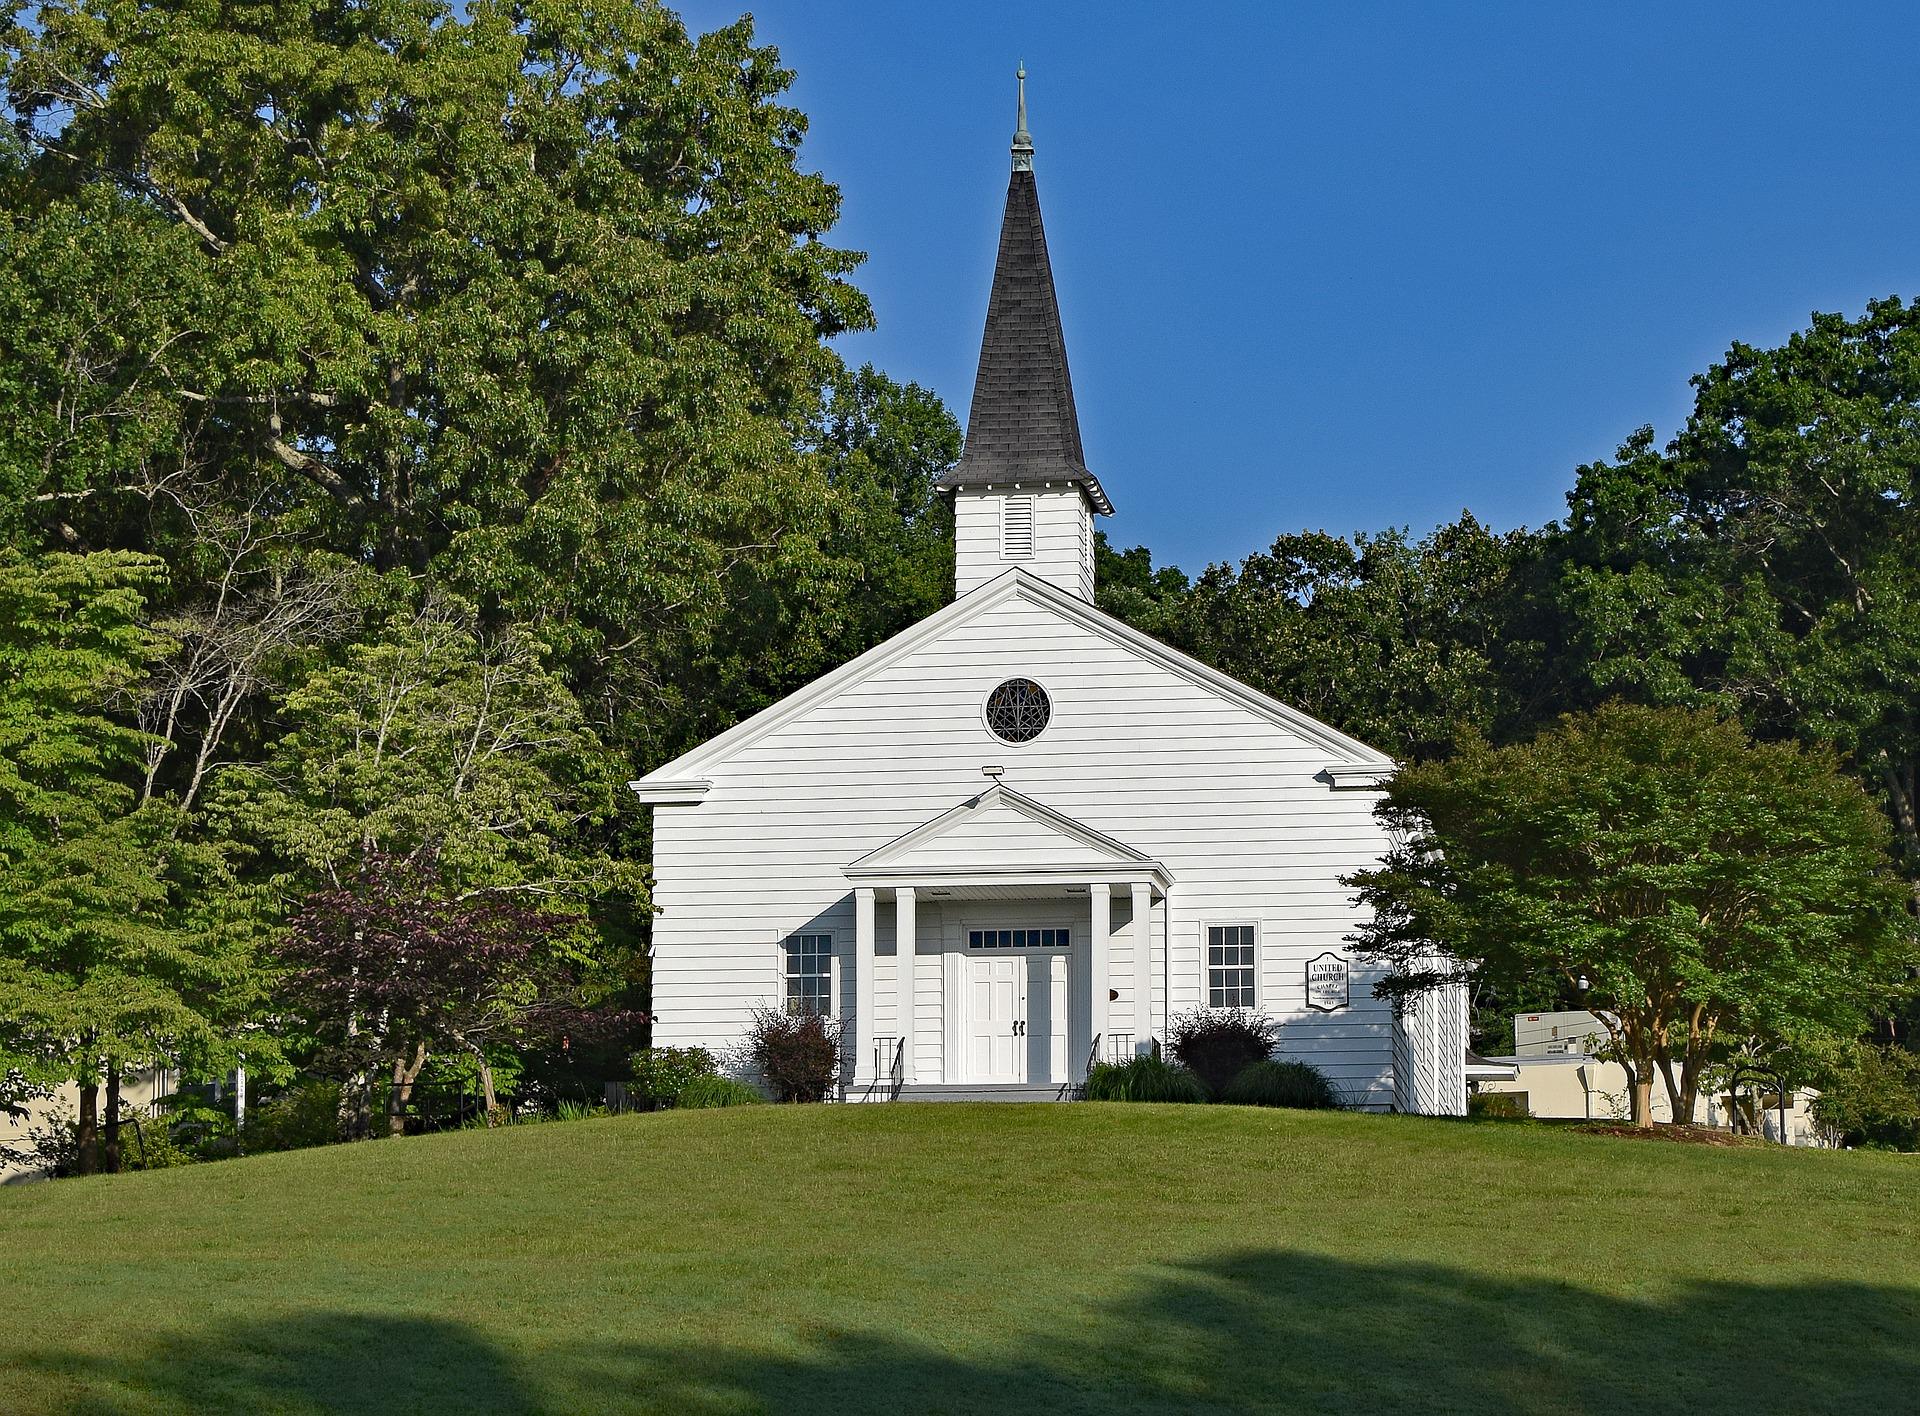 country-church-2413911_1920W